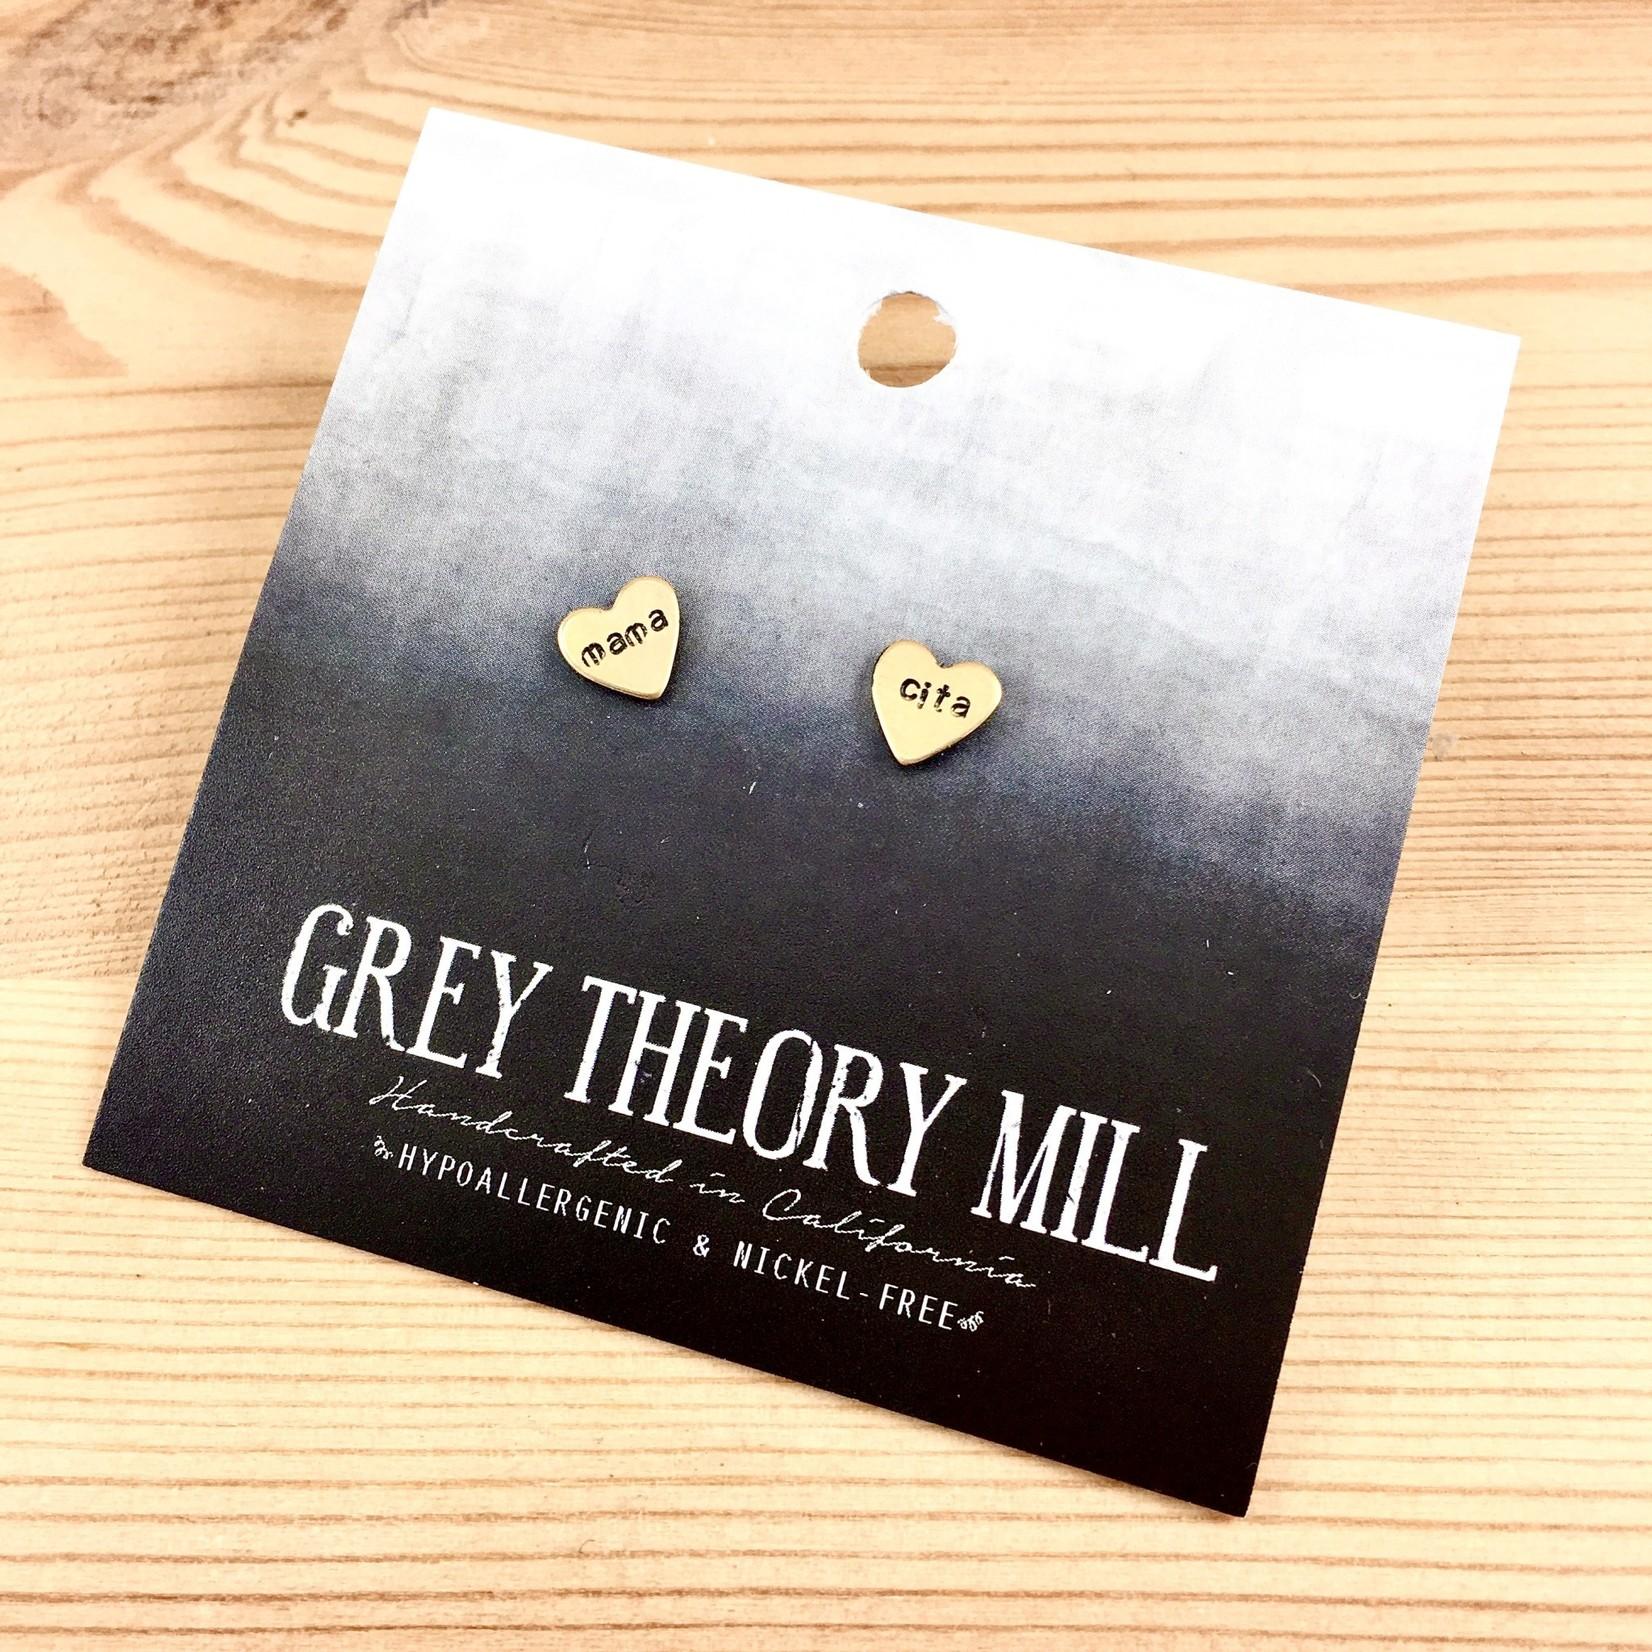 Grey Theory Mill Mama-Cita Stud Earrings